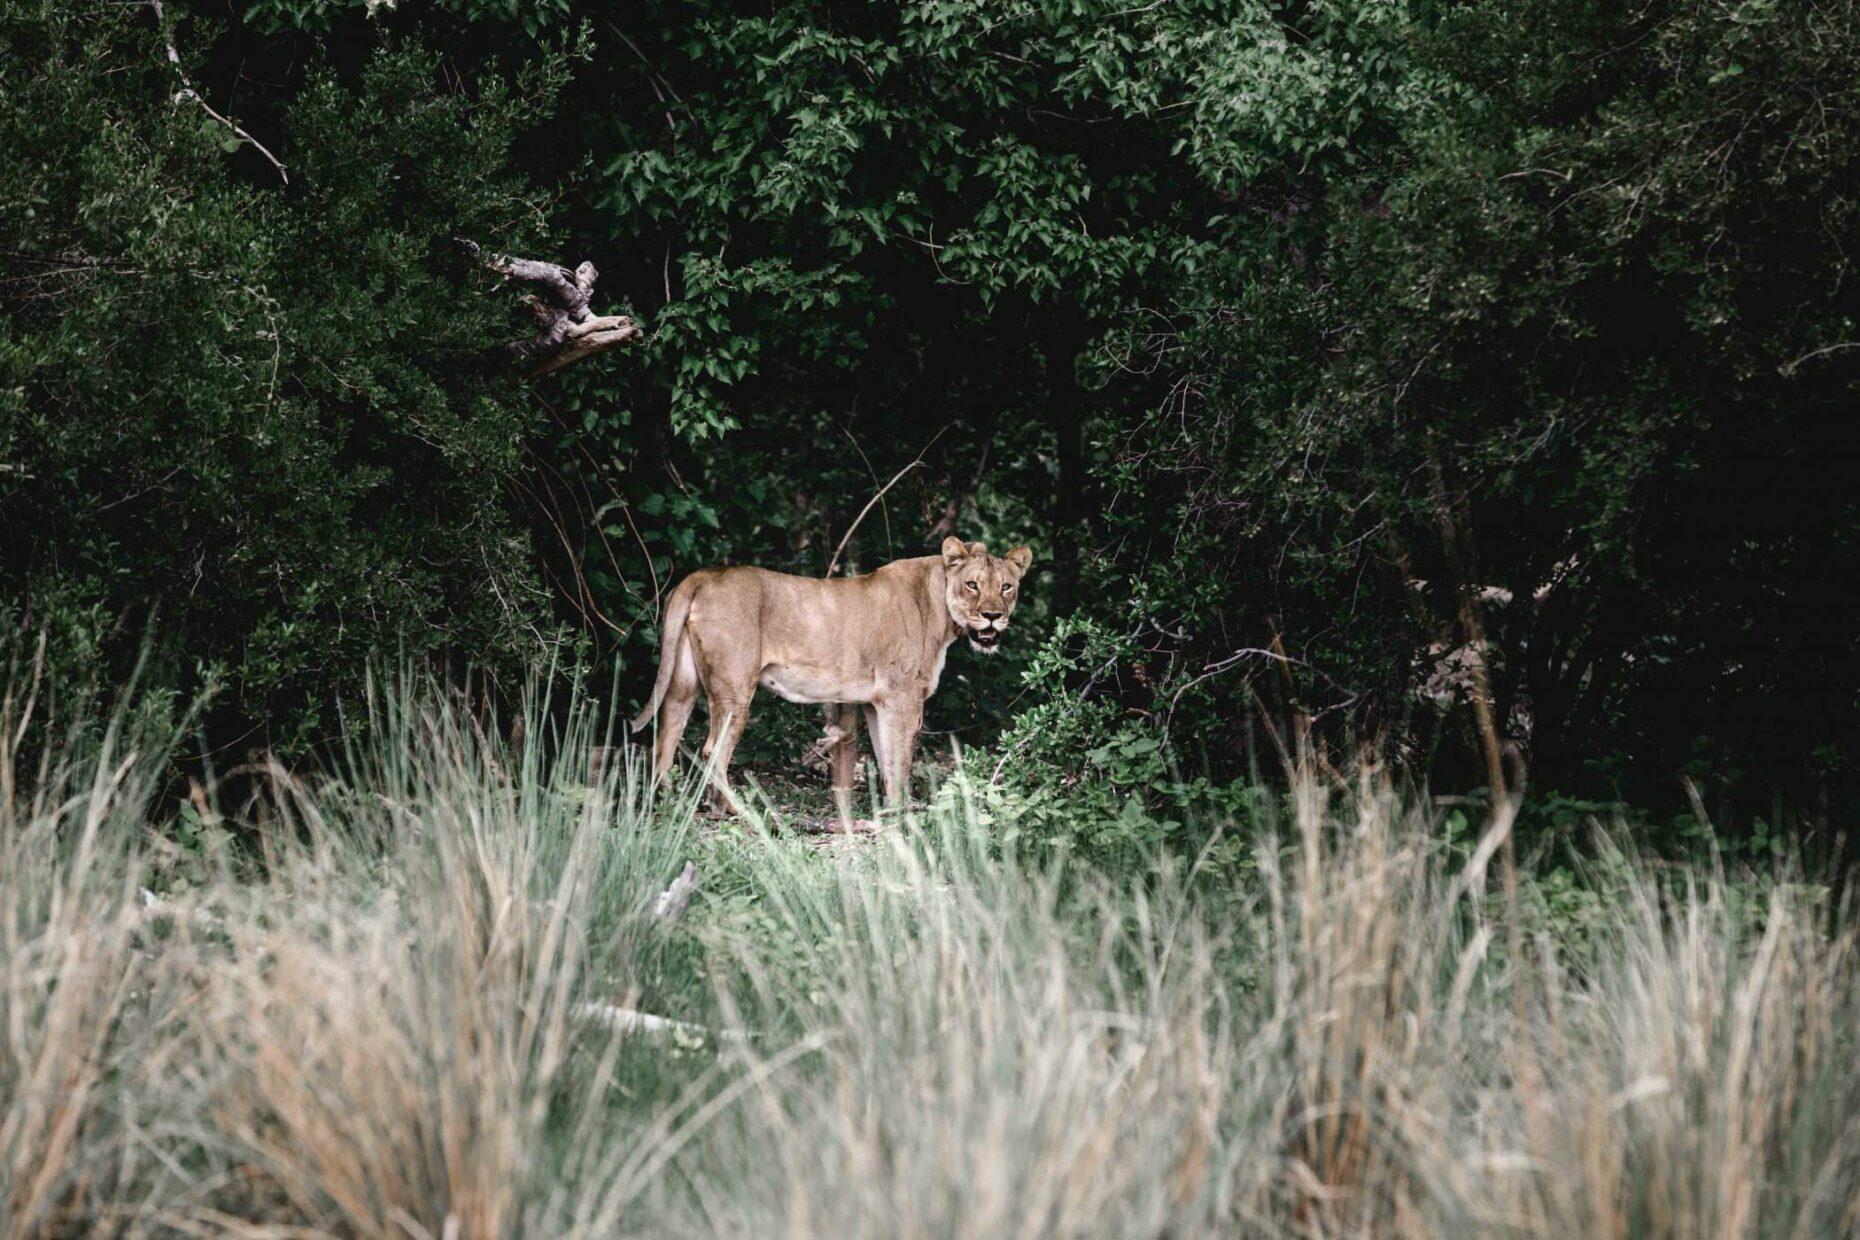 coliving namibia female lion at a safari tour